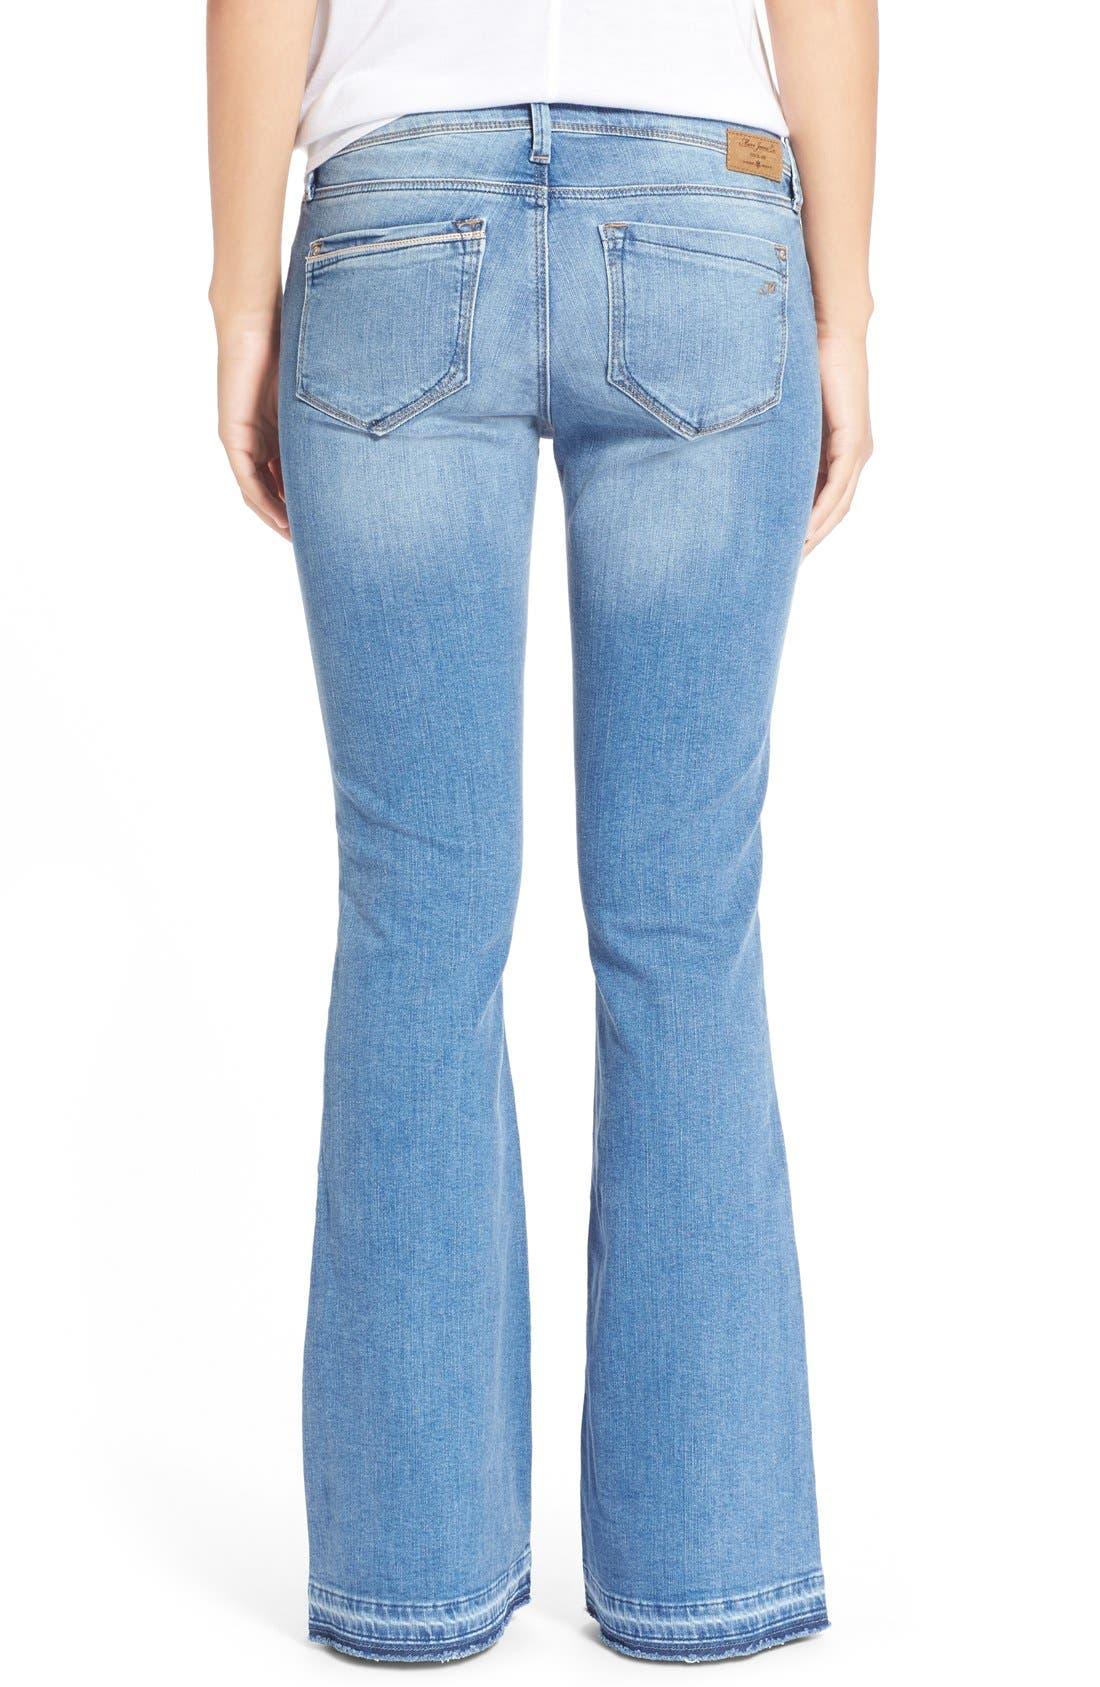 Alternate Image 2  - Mavi Jeans 'Peace' Stretch Flare Leg Jeans (Light Ripped)